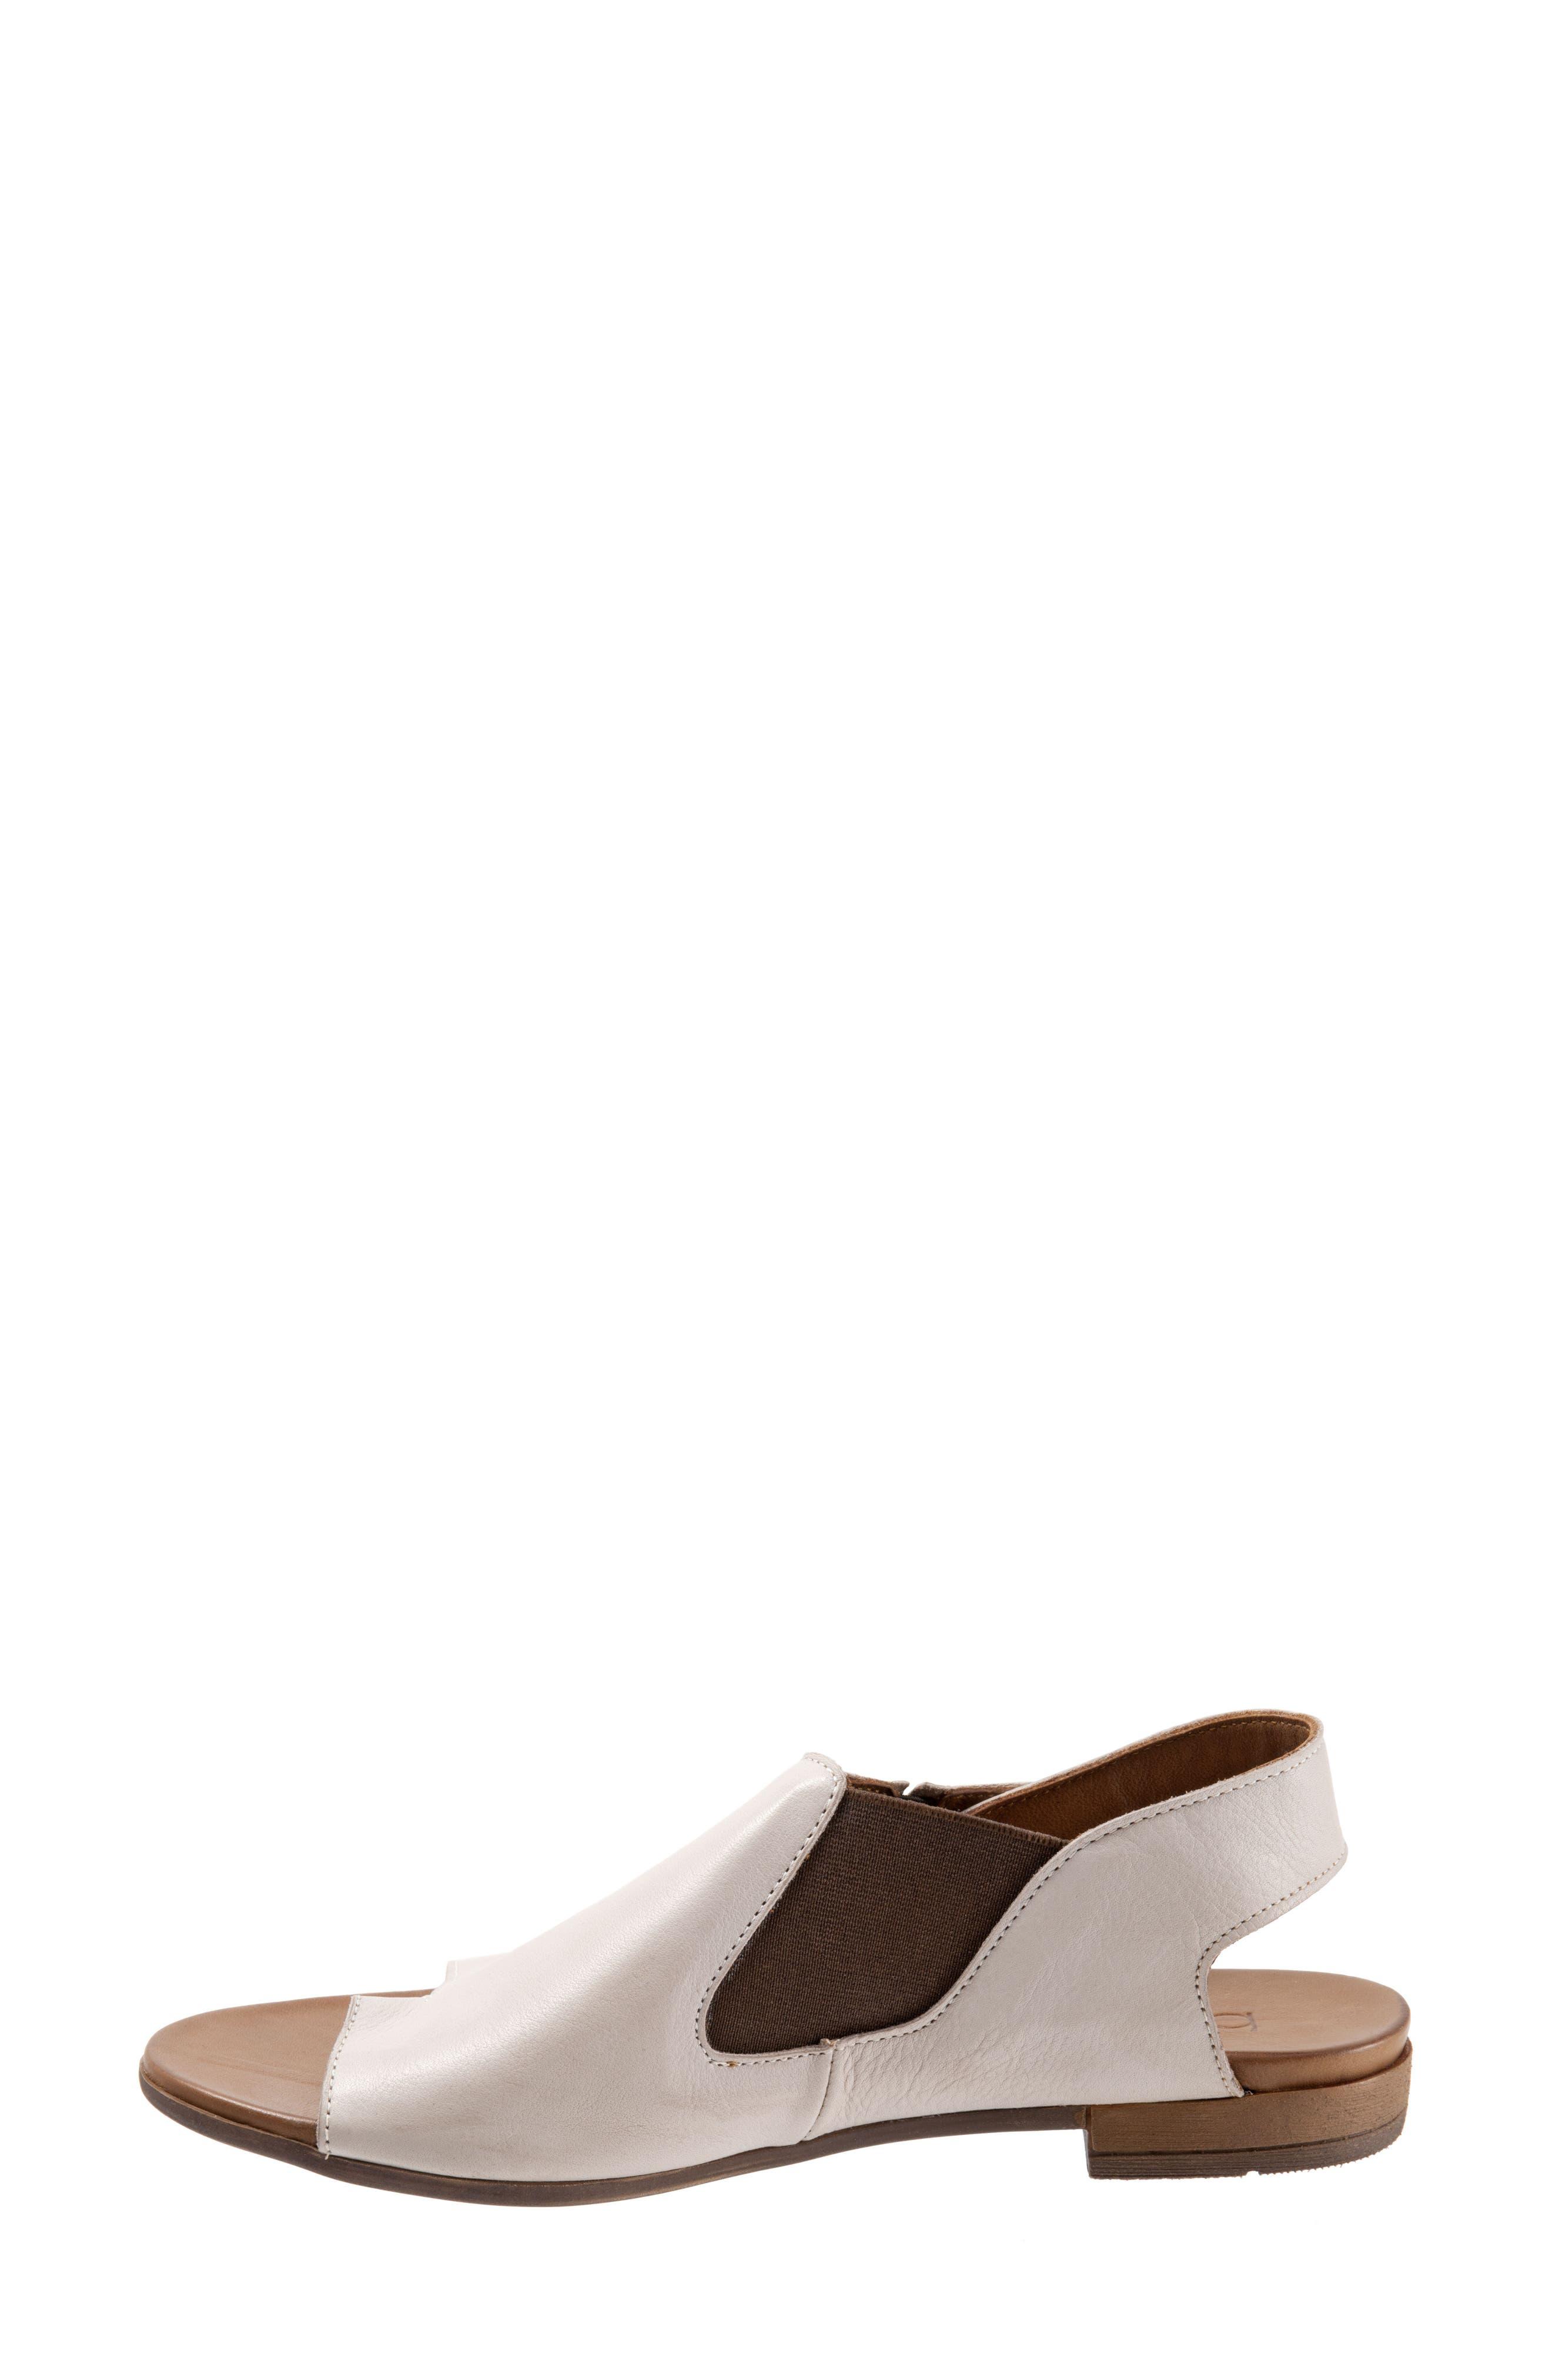 Tessa Sandal,                             Alternate thumbnail 4, color,                             Light Grey Leather